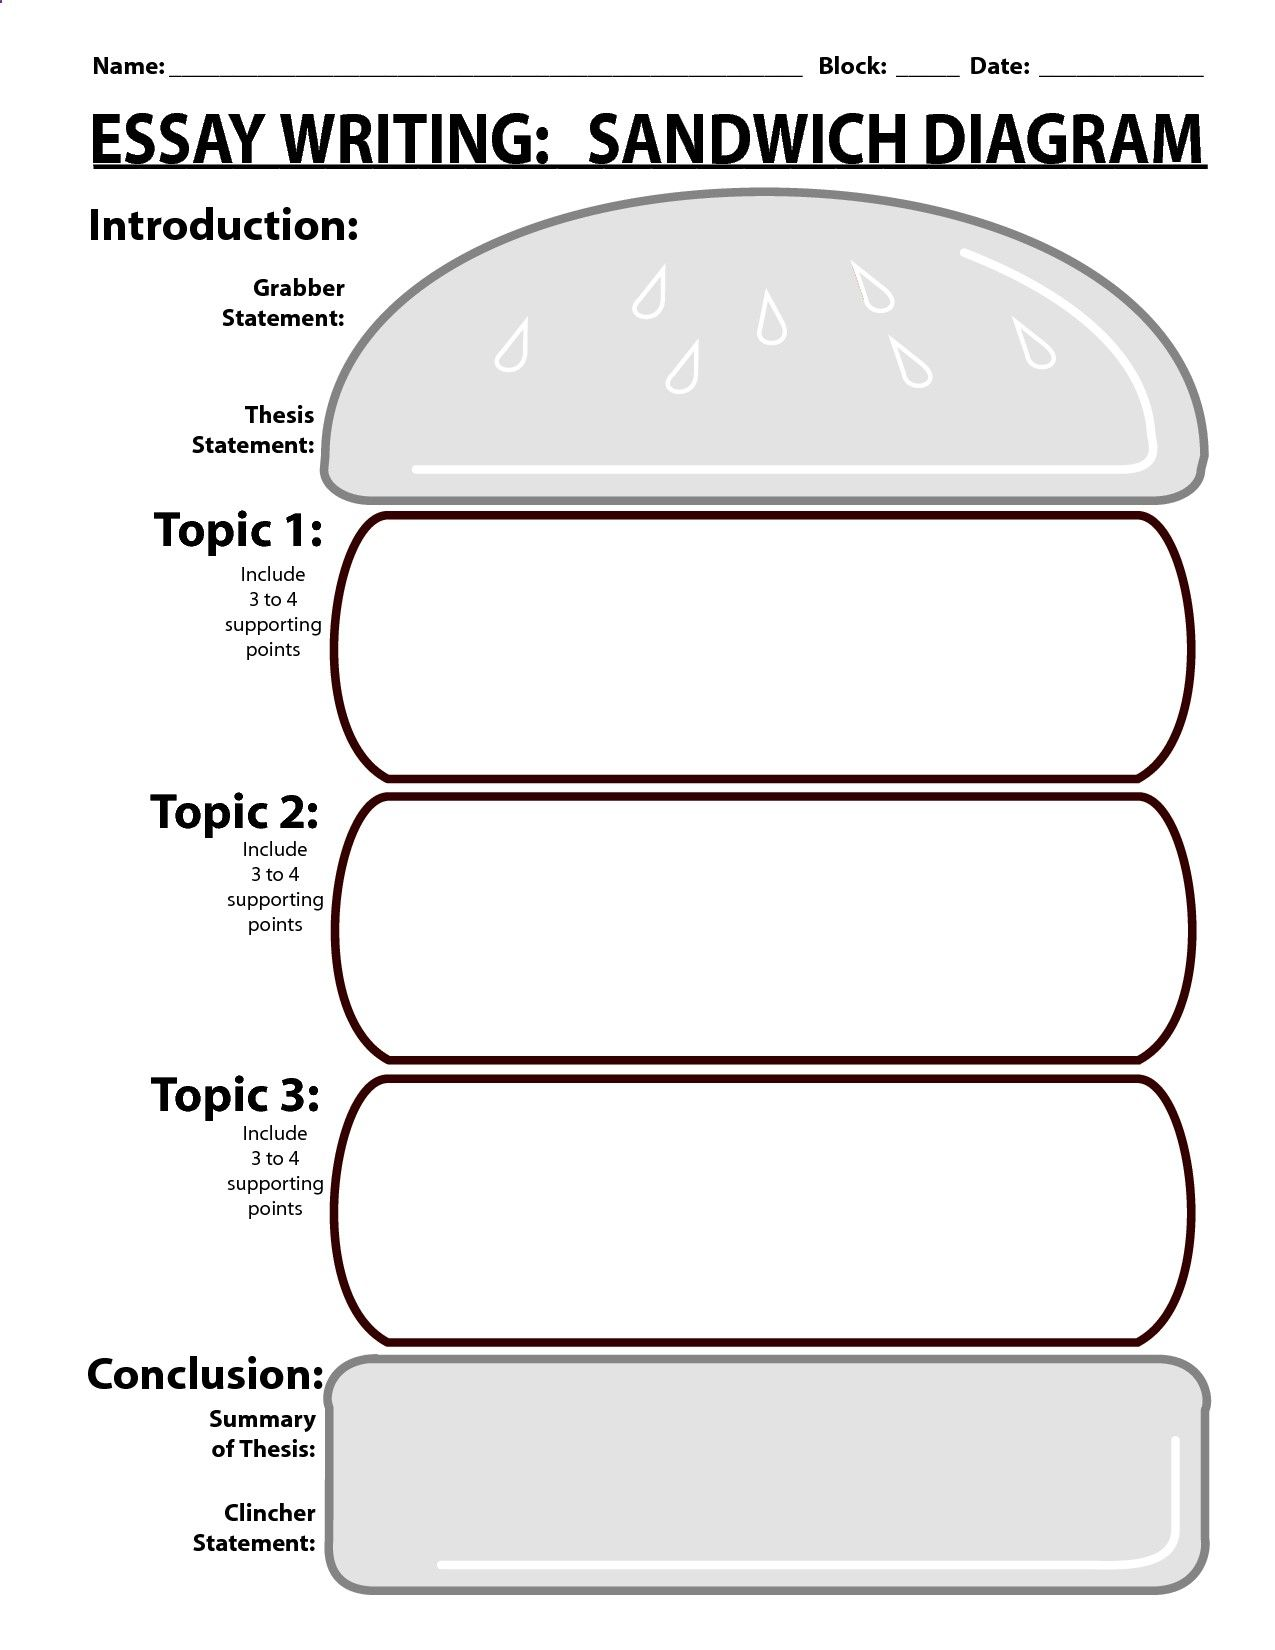 Essay writing sandwich diagram pdf diy enthusiasts wiring diagrams sandwich writing template essay writing sandwich diagram pdf rh pinterest ca sandwich book report template print maxwellsz